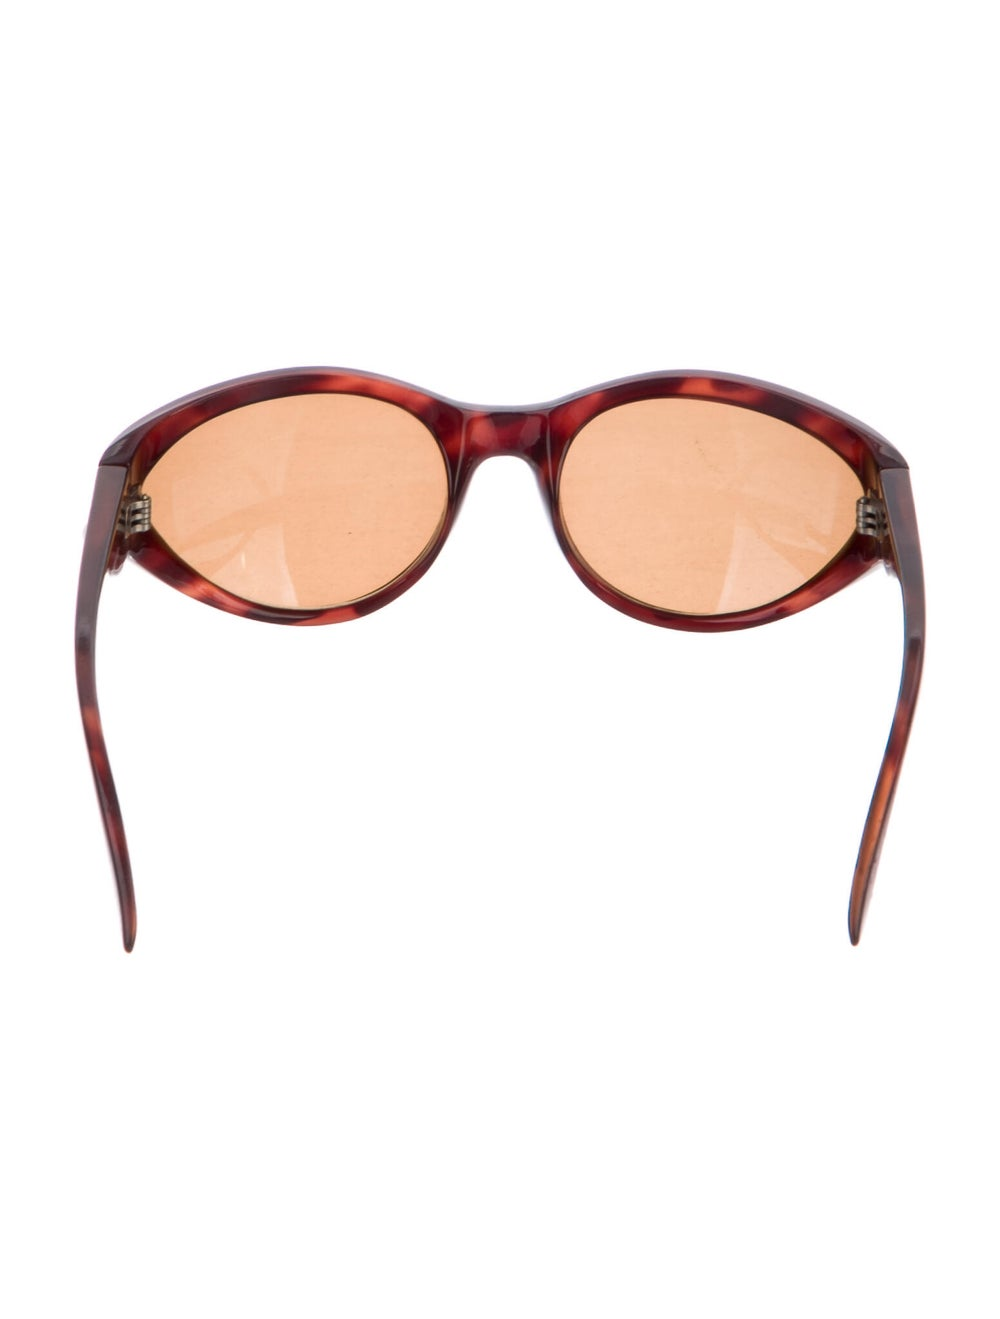 Gianni Versace Cat-Eye Tinted Sunglasses Brown - image 3